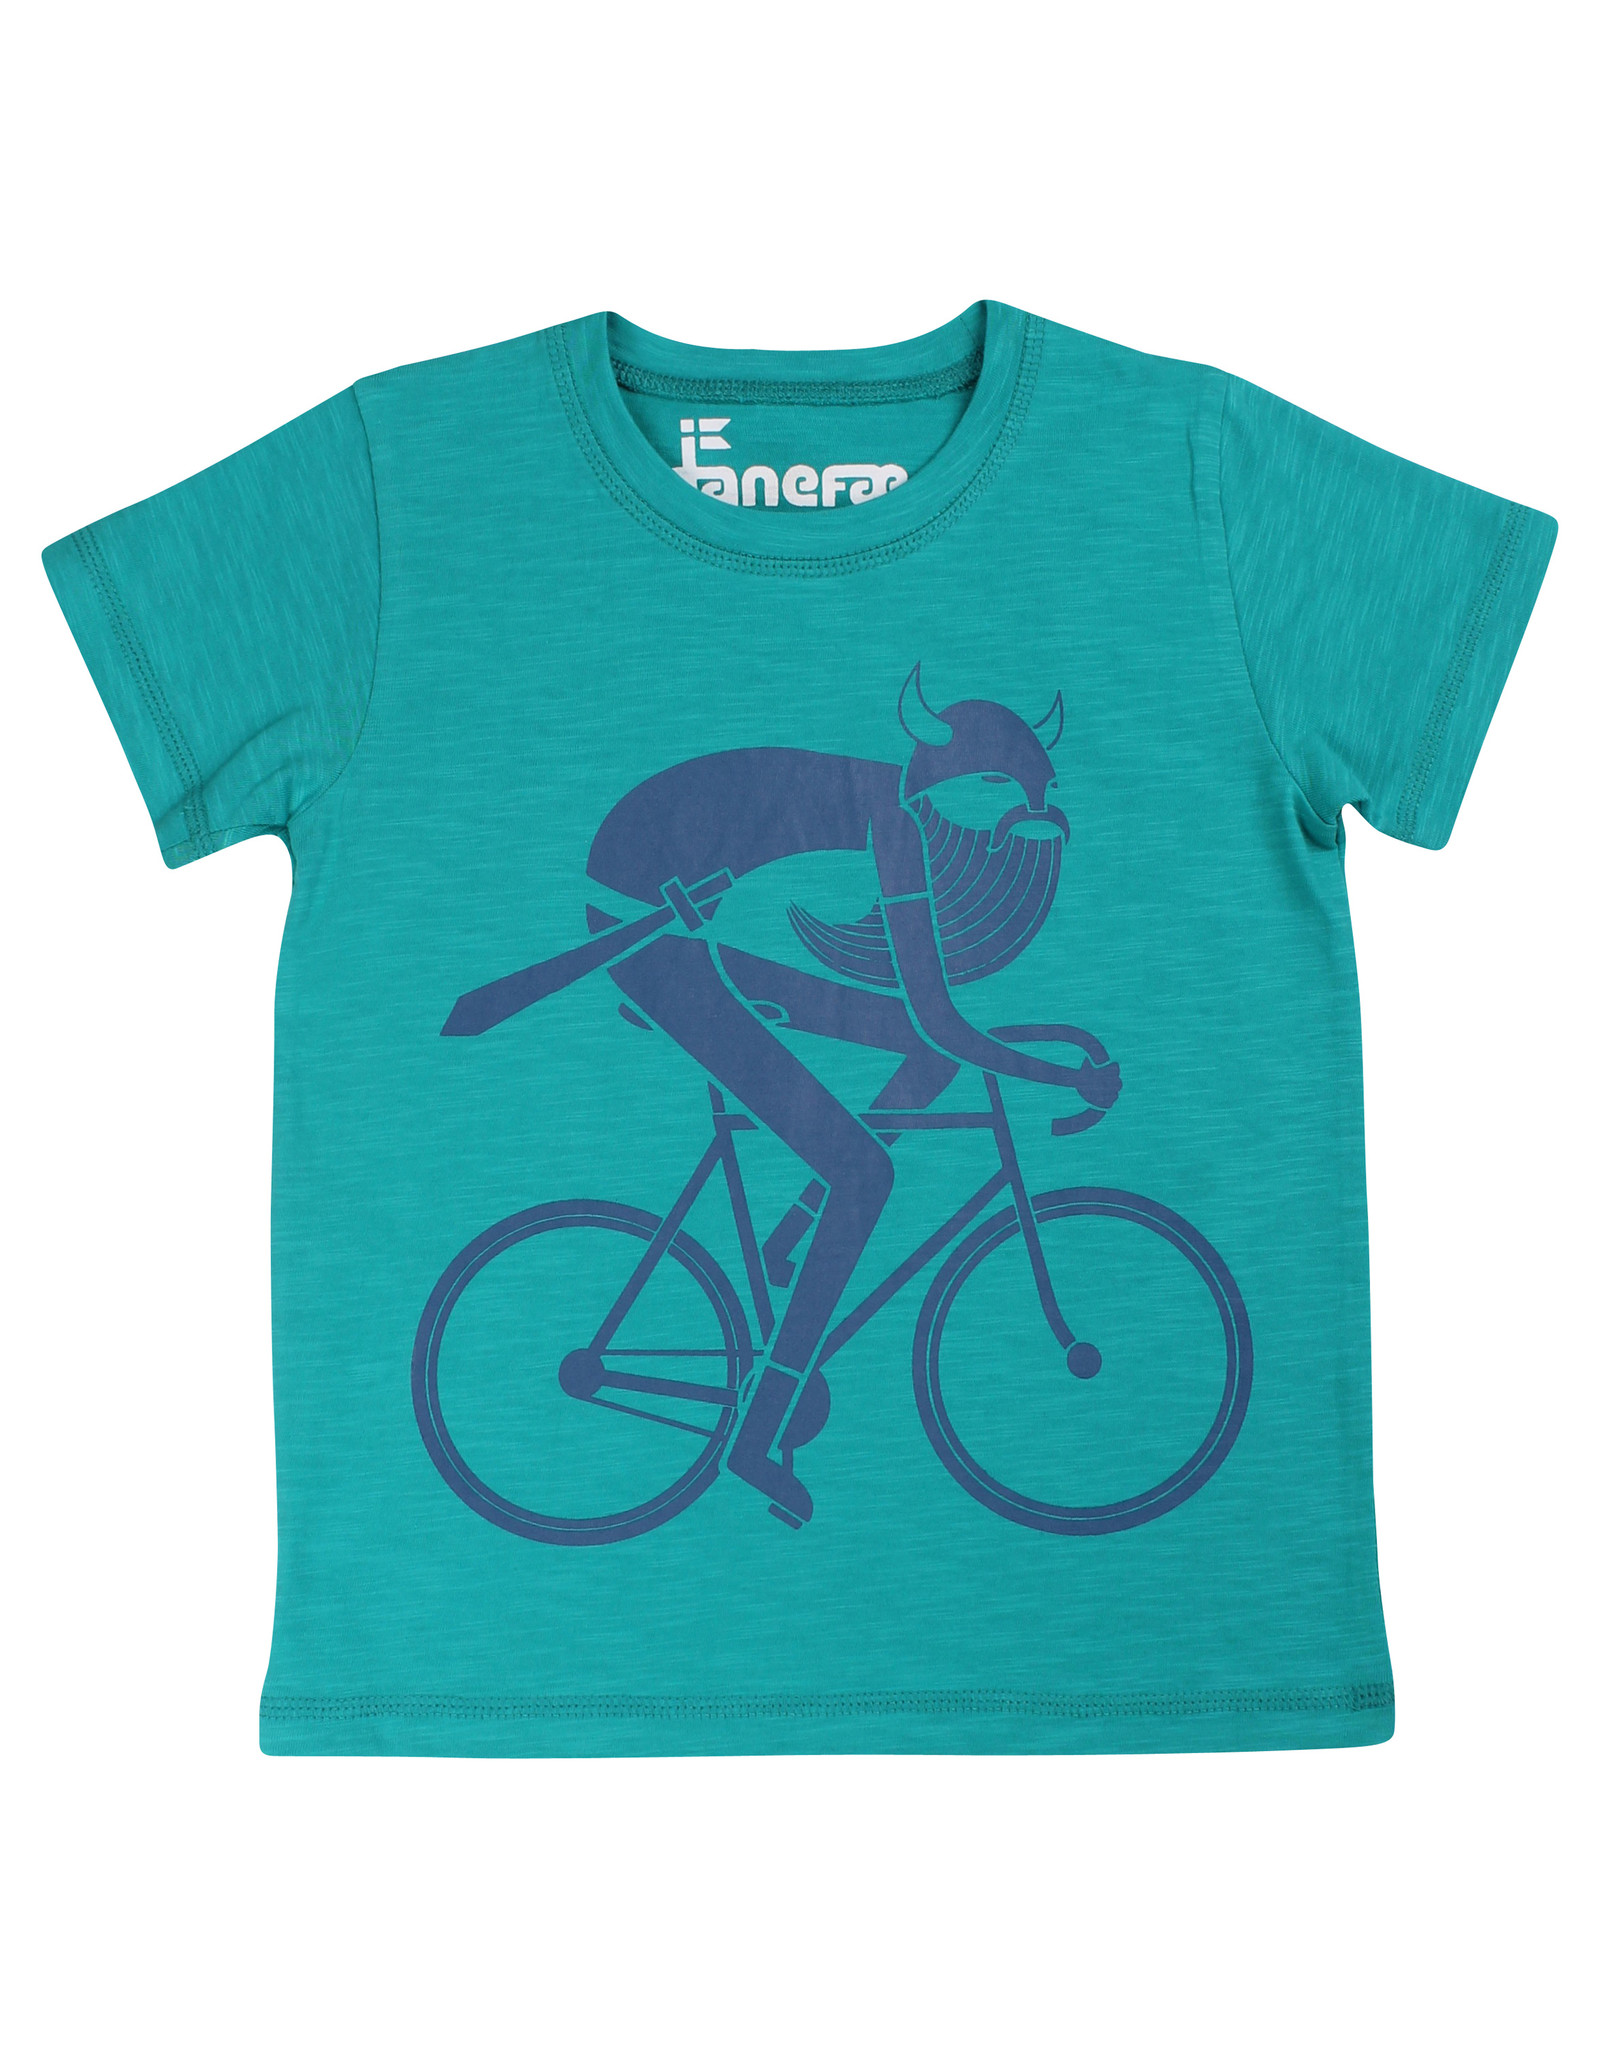 Danefae Children's t-shirt - turquoise viking